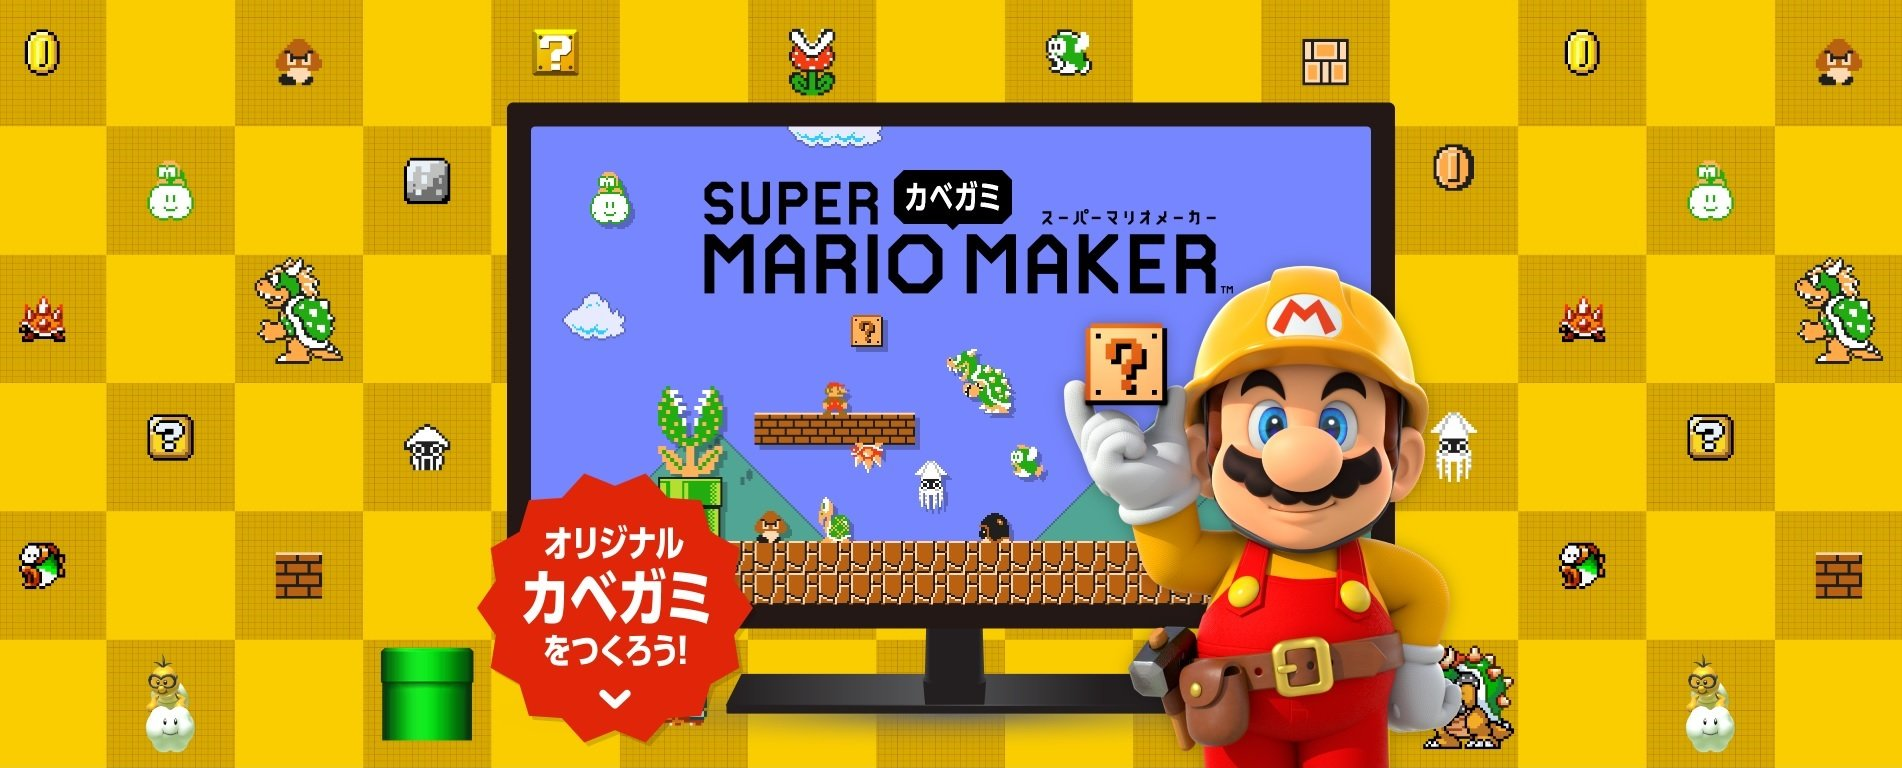 Mario maker wallpaper 1920x1080 for House creator online